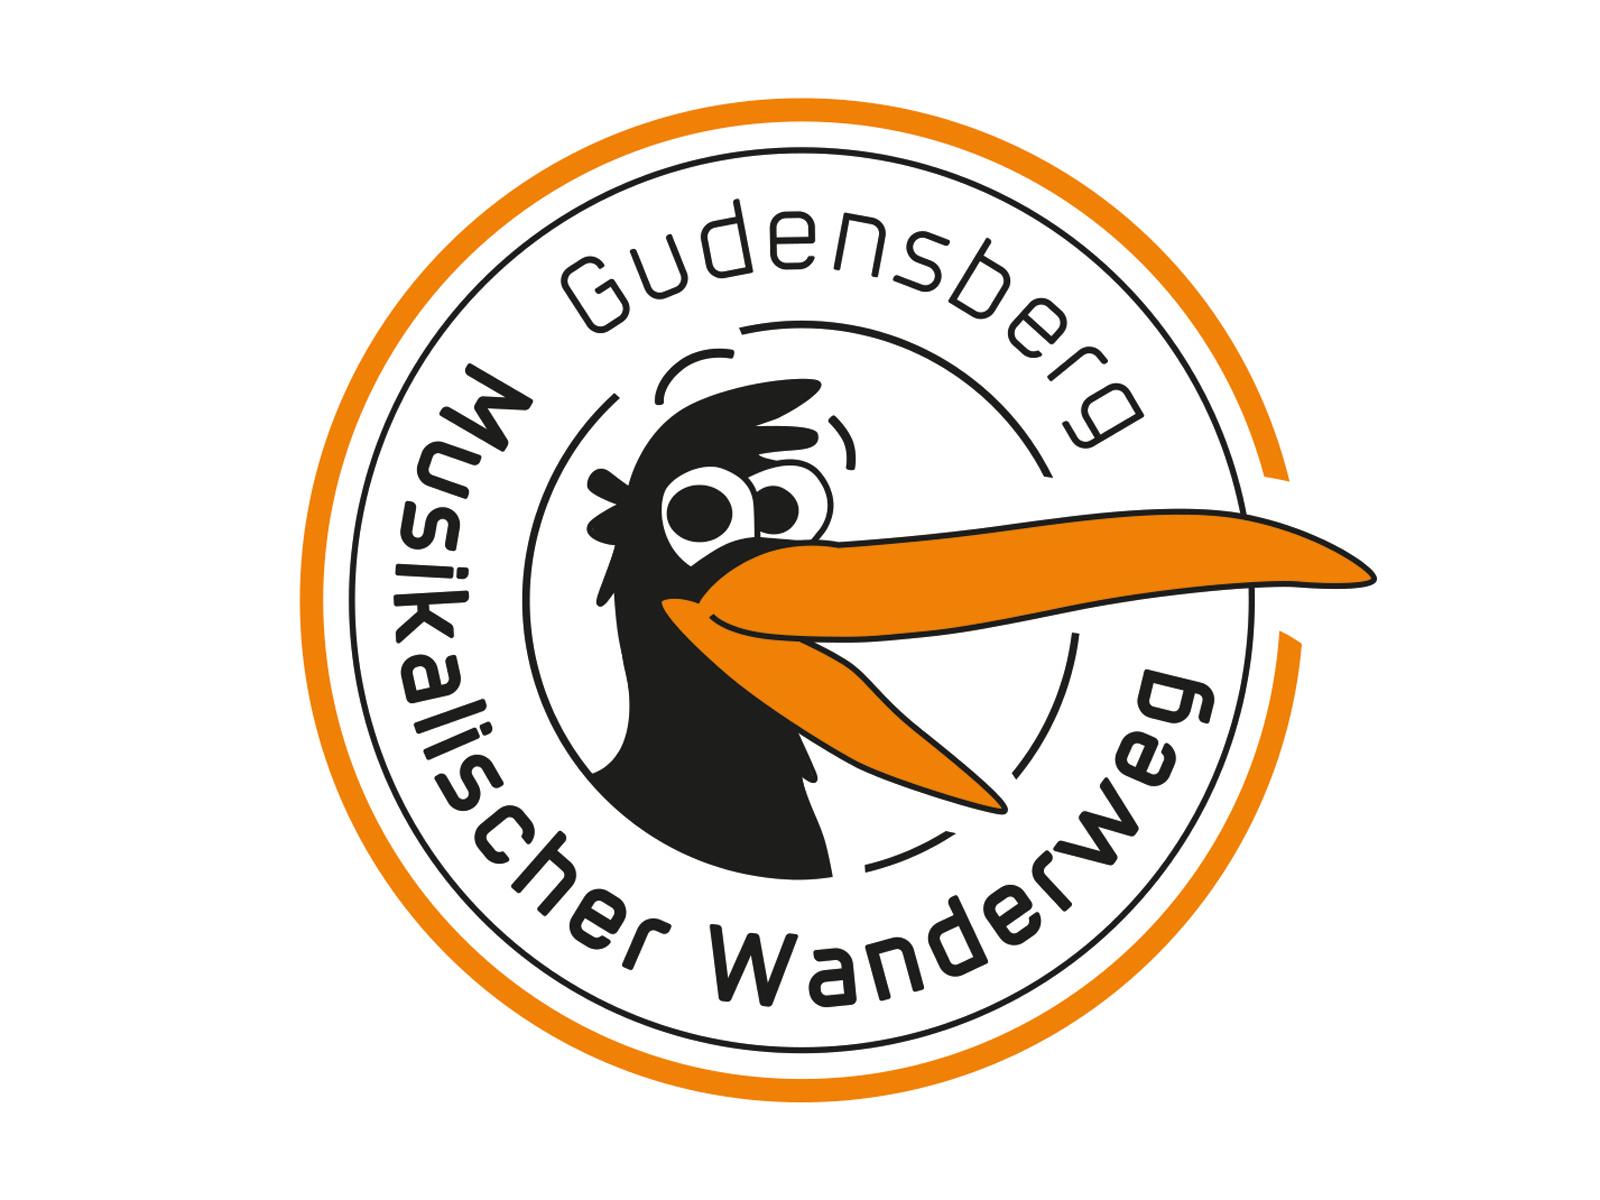 Musikalischer Wanderweg Gudensberg